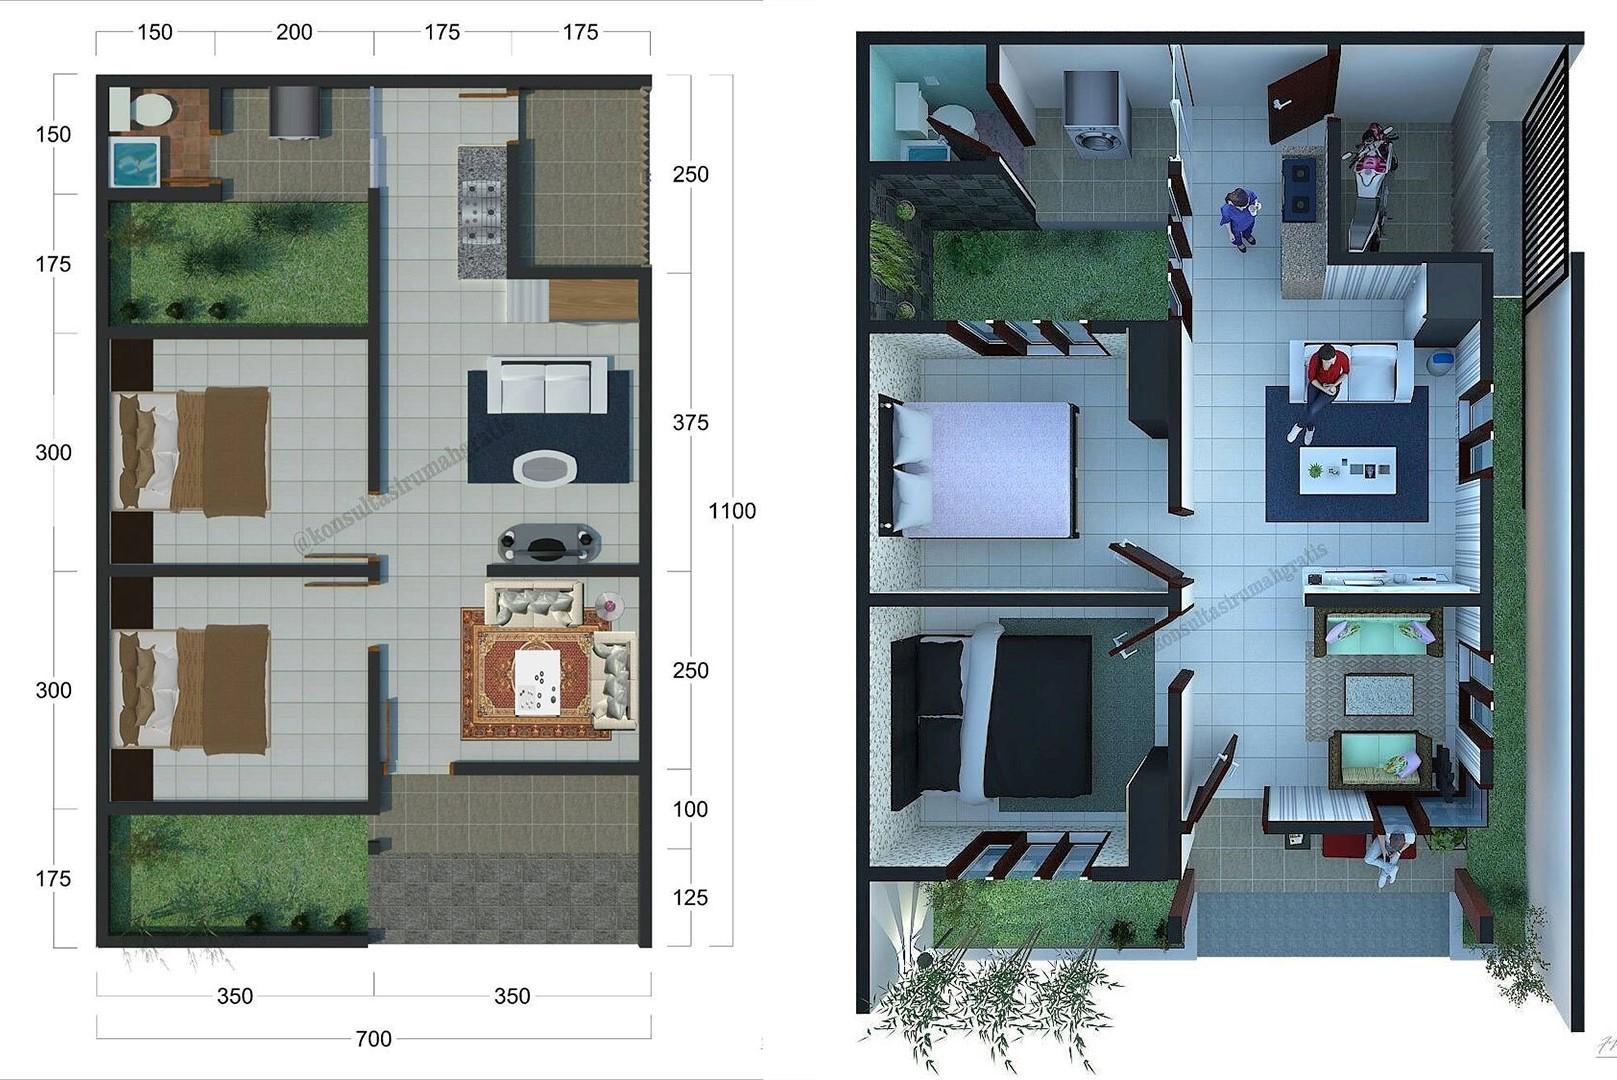 Denah Rumah Sederhana 2 Kamar Tidur Rumah Minimalis 3d